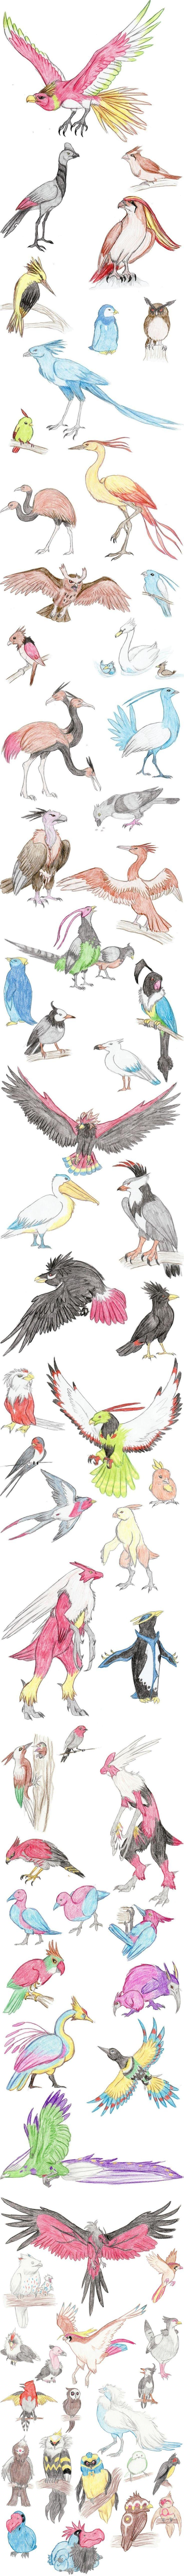 Bird Pokemon by DragonlordRynn on DeviantArt